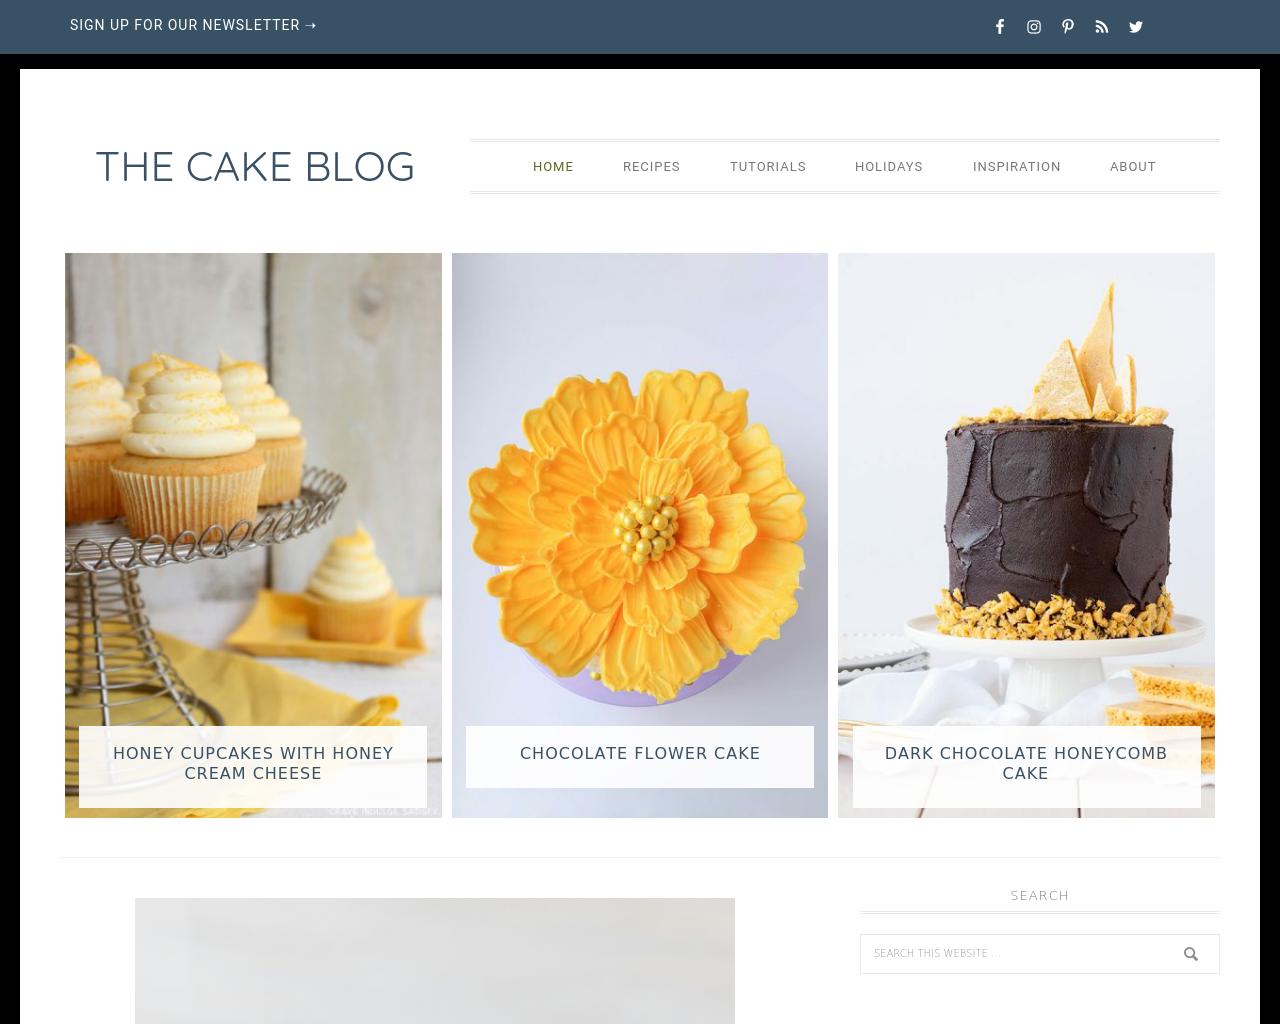 The-Cake-Blog-Advertising-Reviews-Pricing